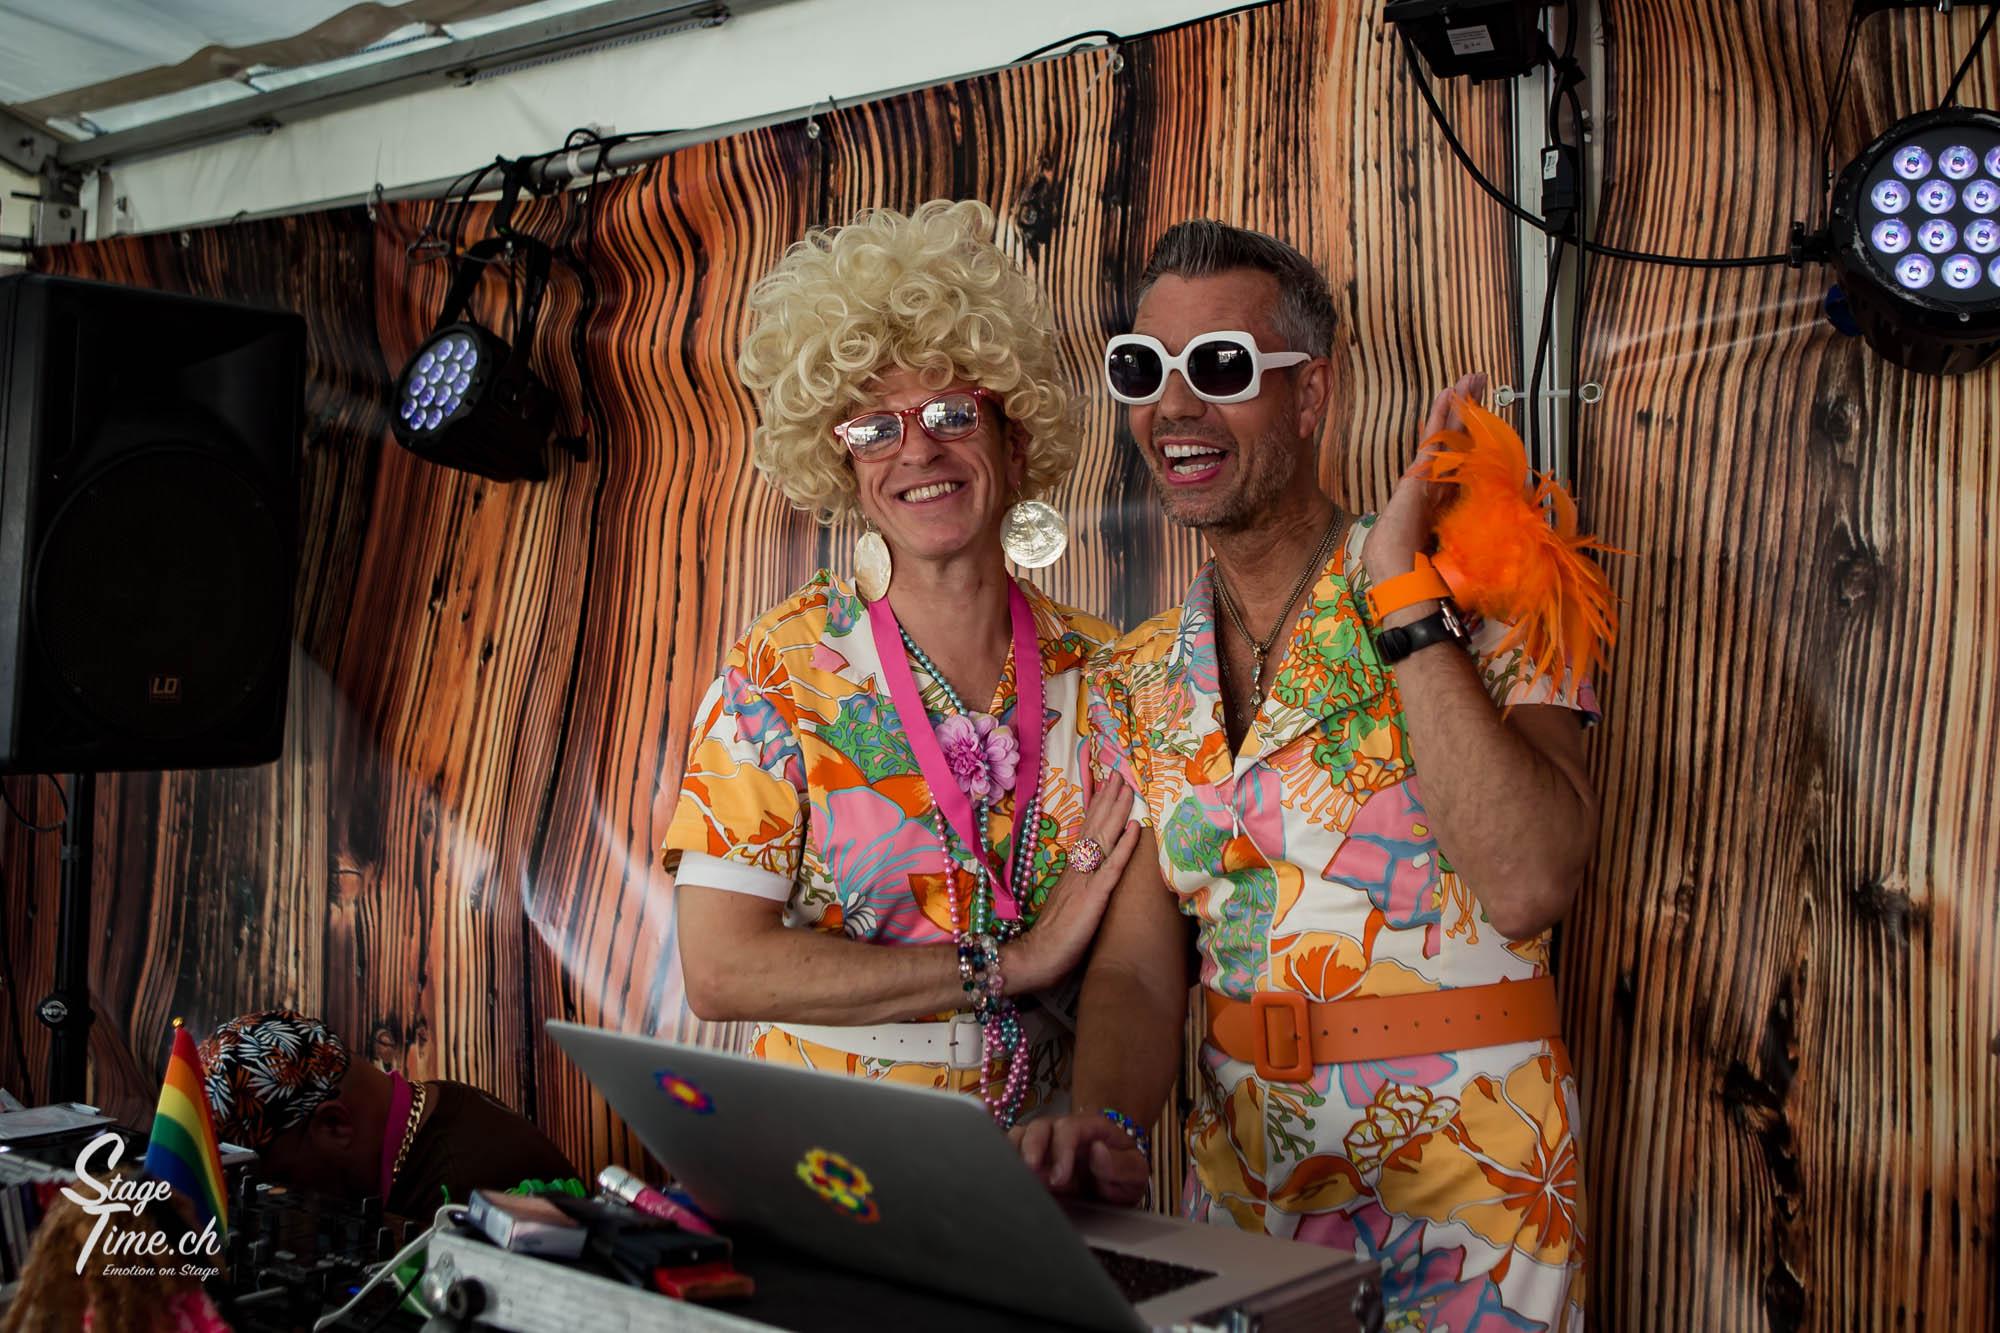 Zurich_Pride_Festival_2018___📷_Christoph_Gurtner___stagetime.ch-6